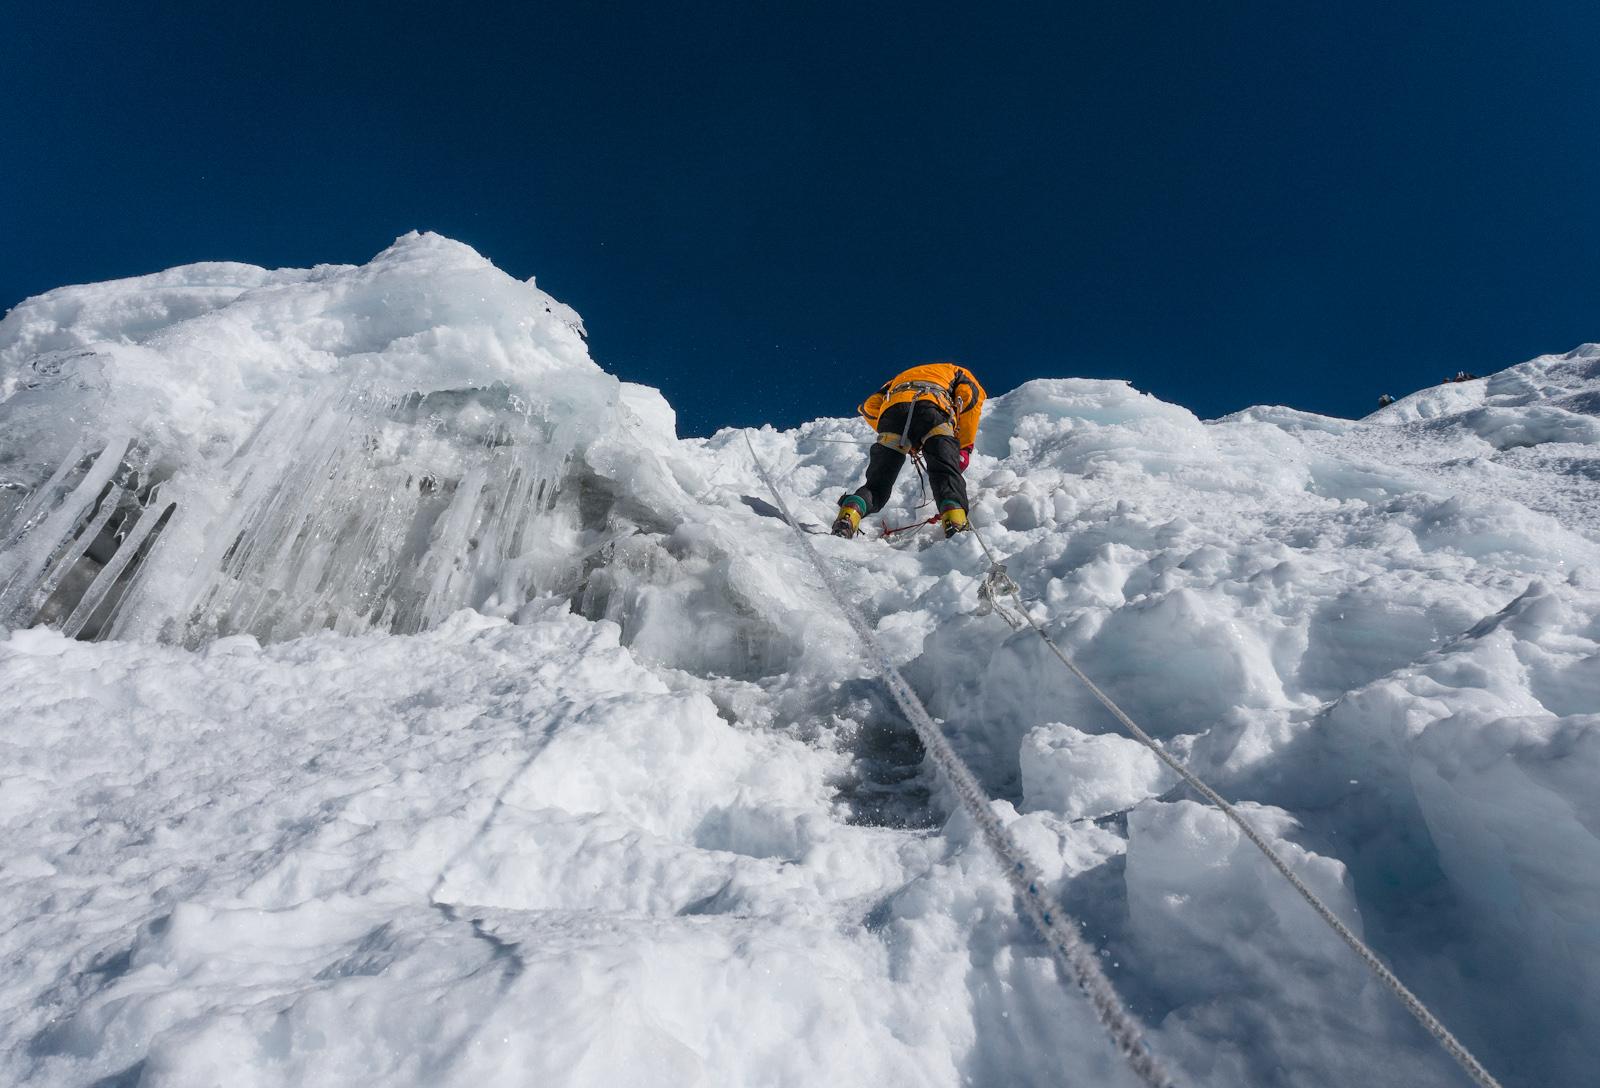 Island Peak Climbing: 6189 m/ 20305 ft